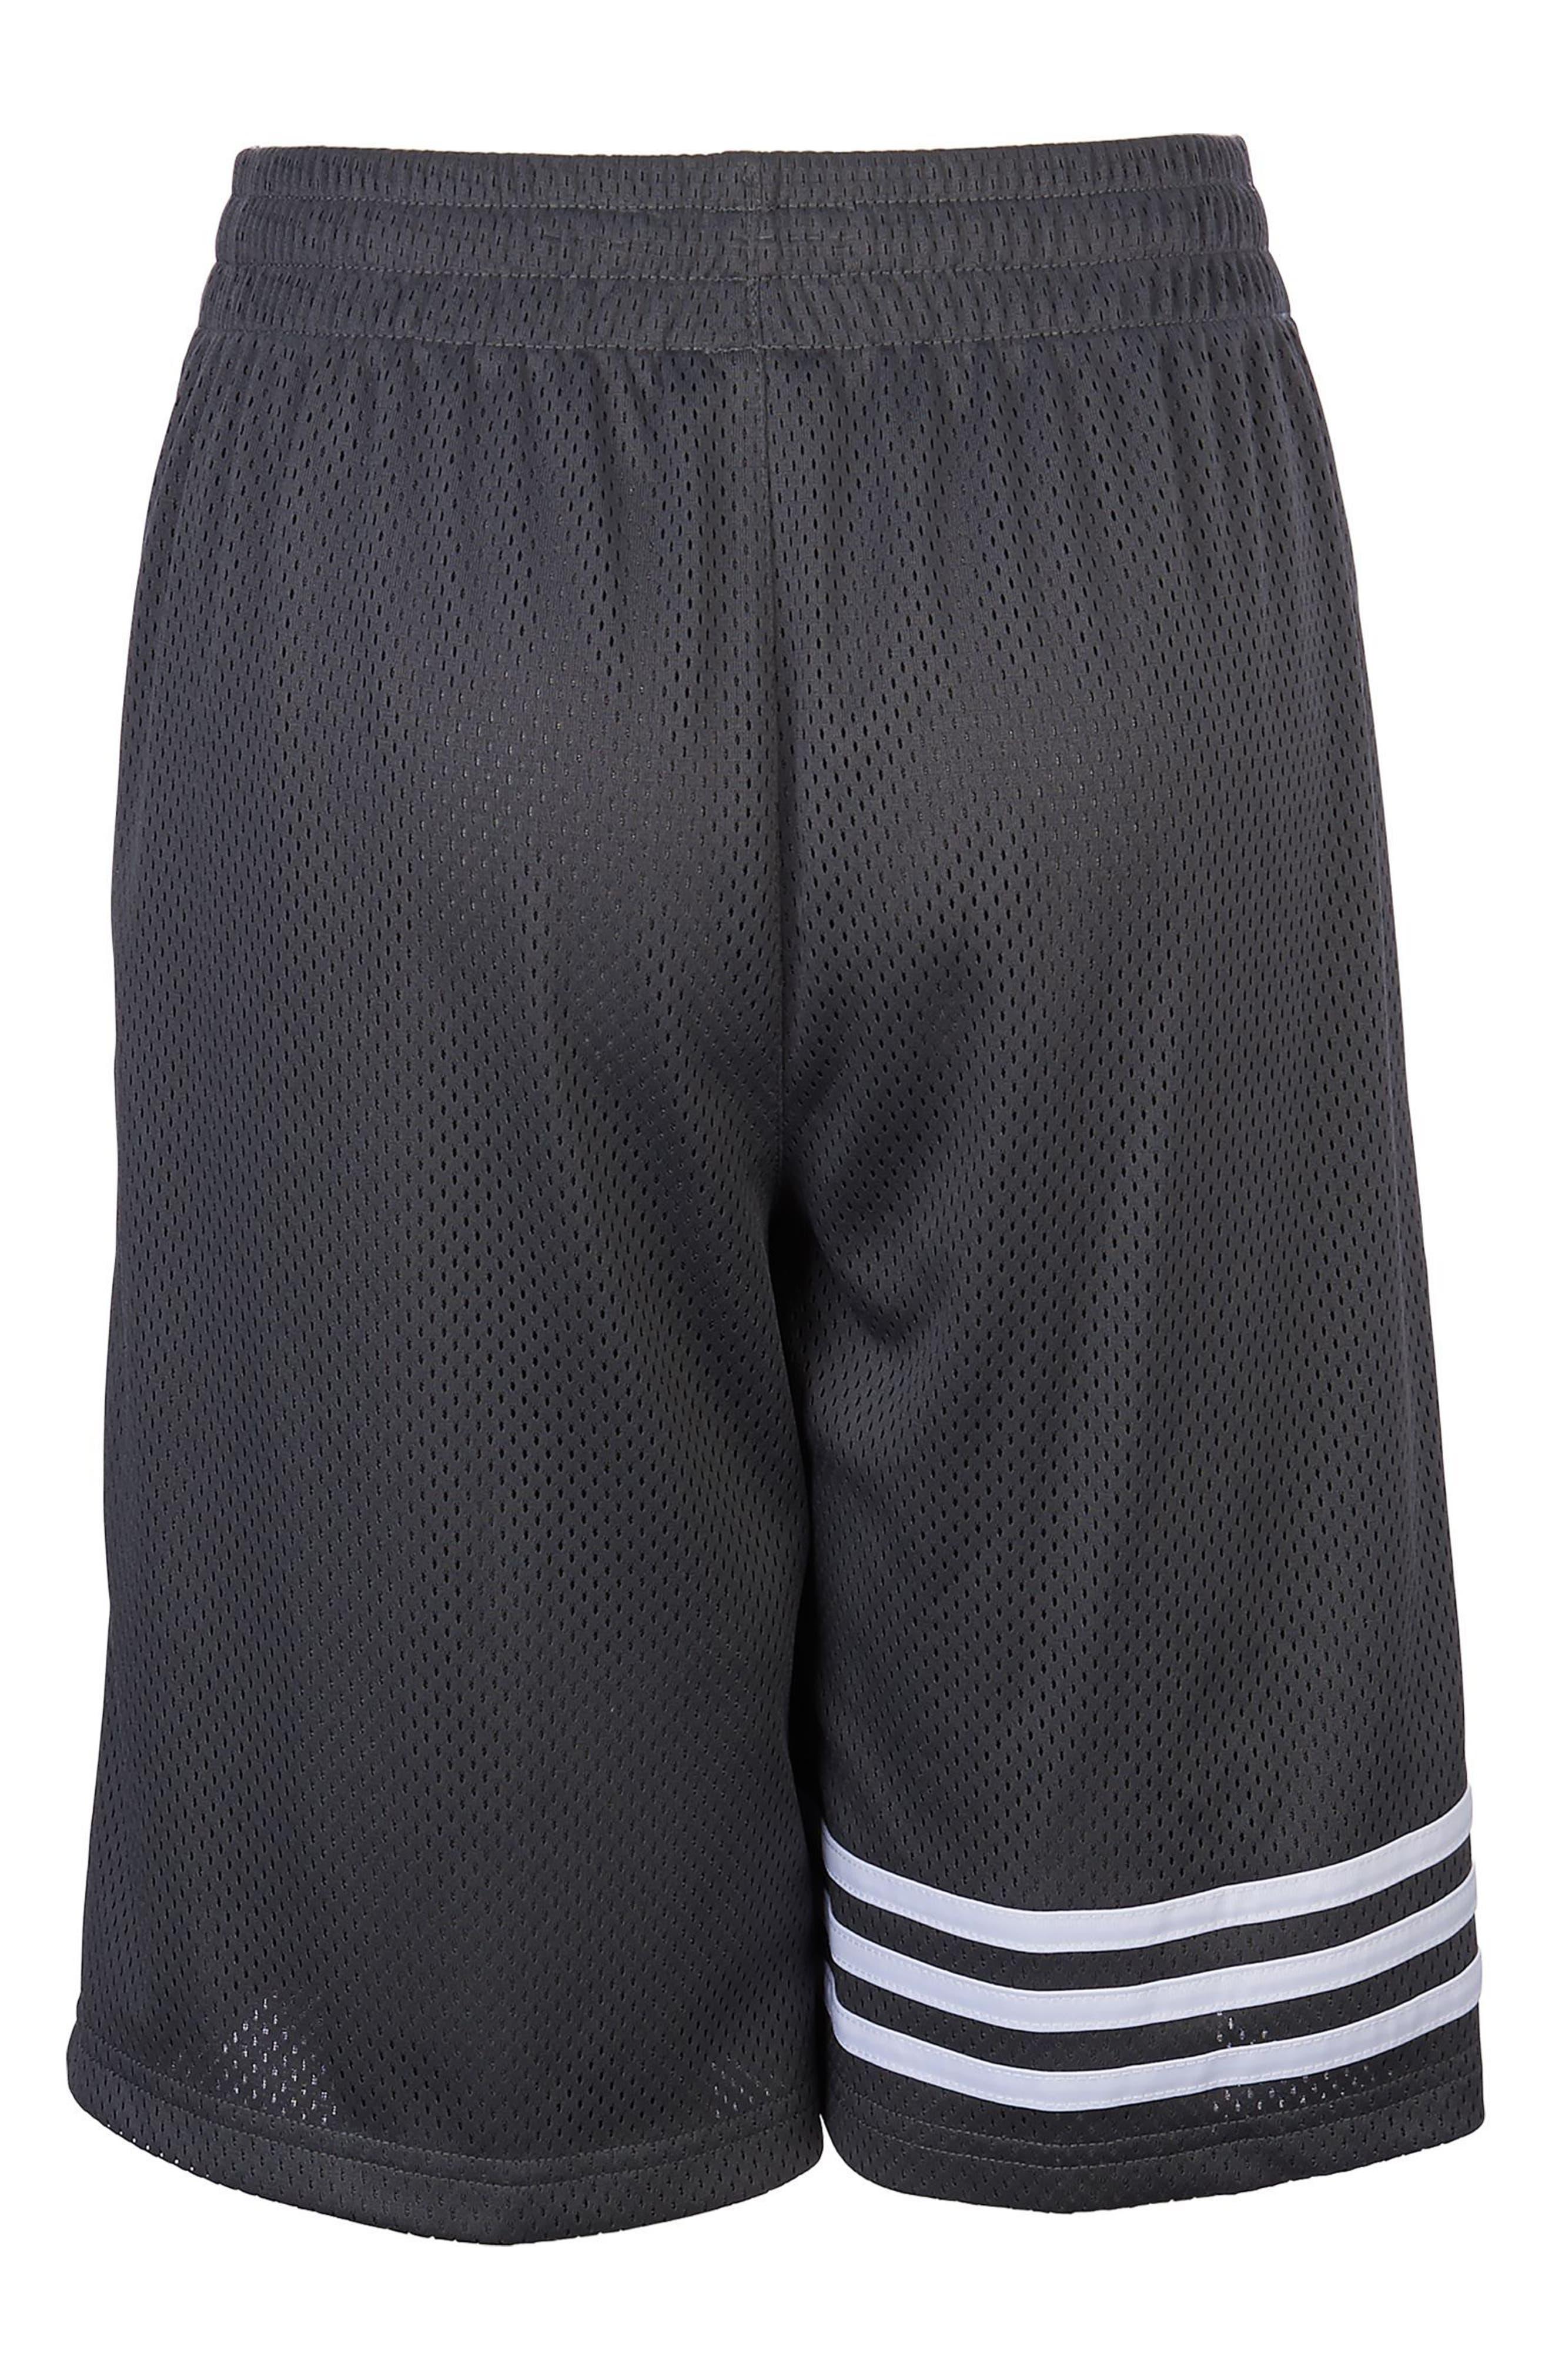 Replenishment Defender Shorts,                             Alternate thumbnail 2, color,                             Dark Grey